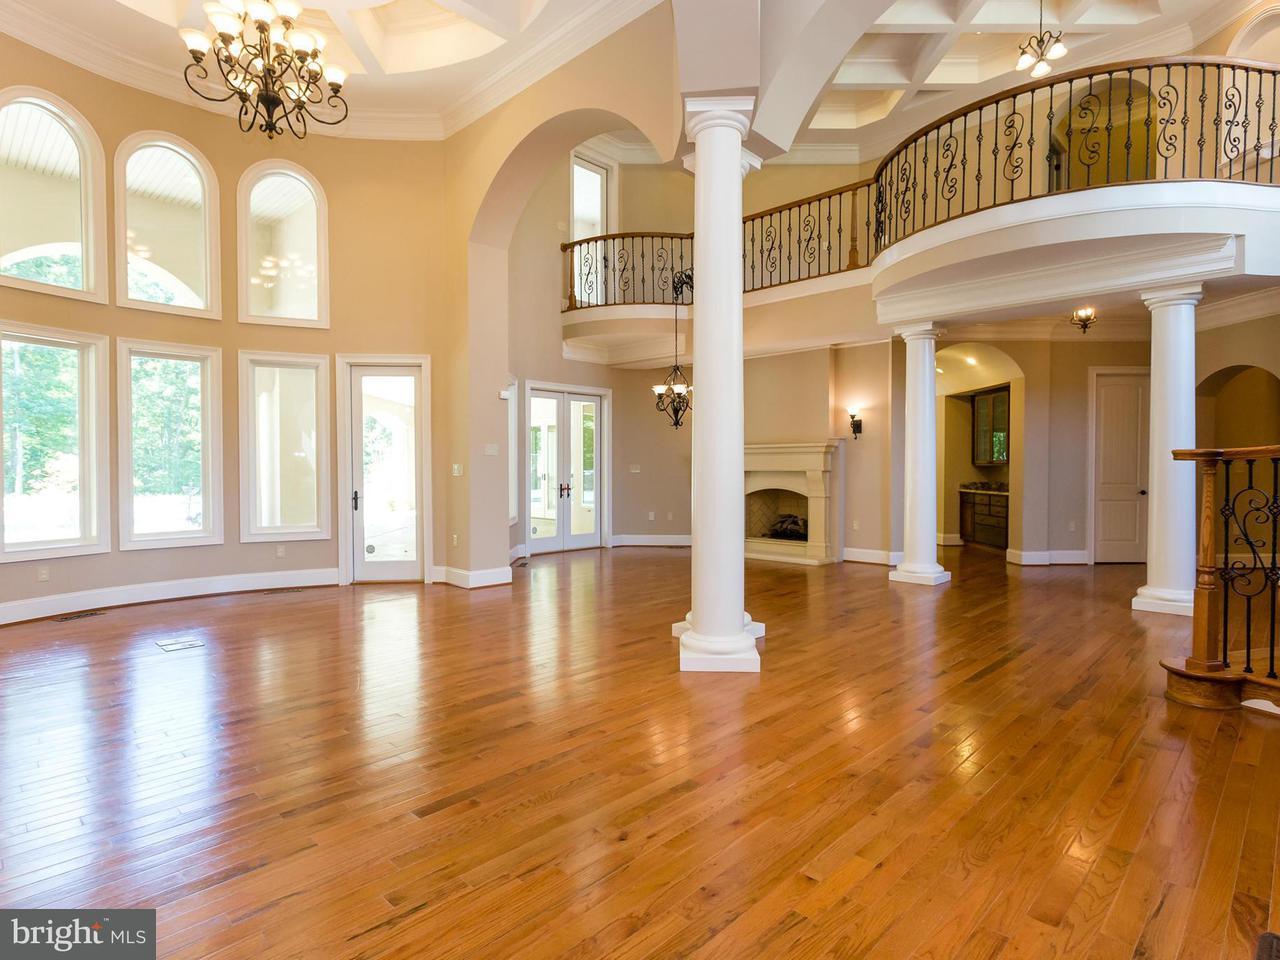 Additional photo for property listing at 328 STORCK Road 328 STORCK Road Fredericksburg, Virginia 22406 Verenigde Staten